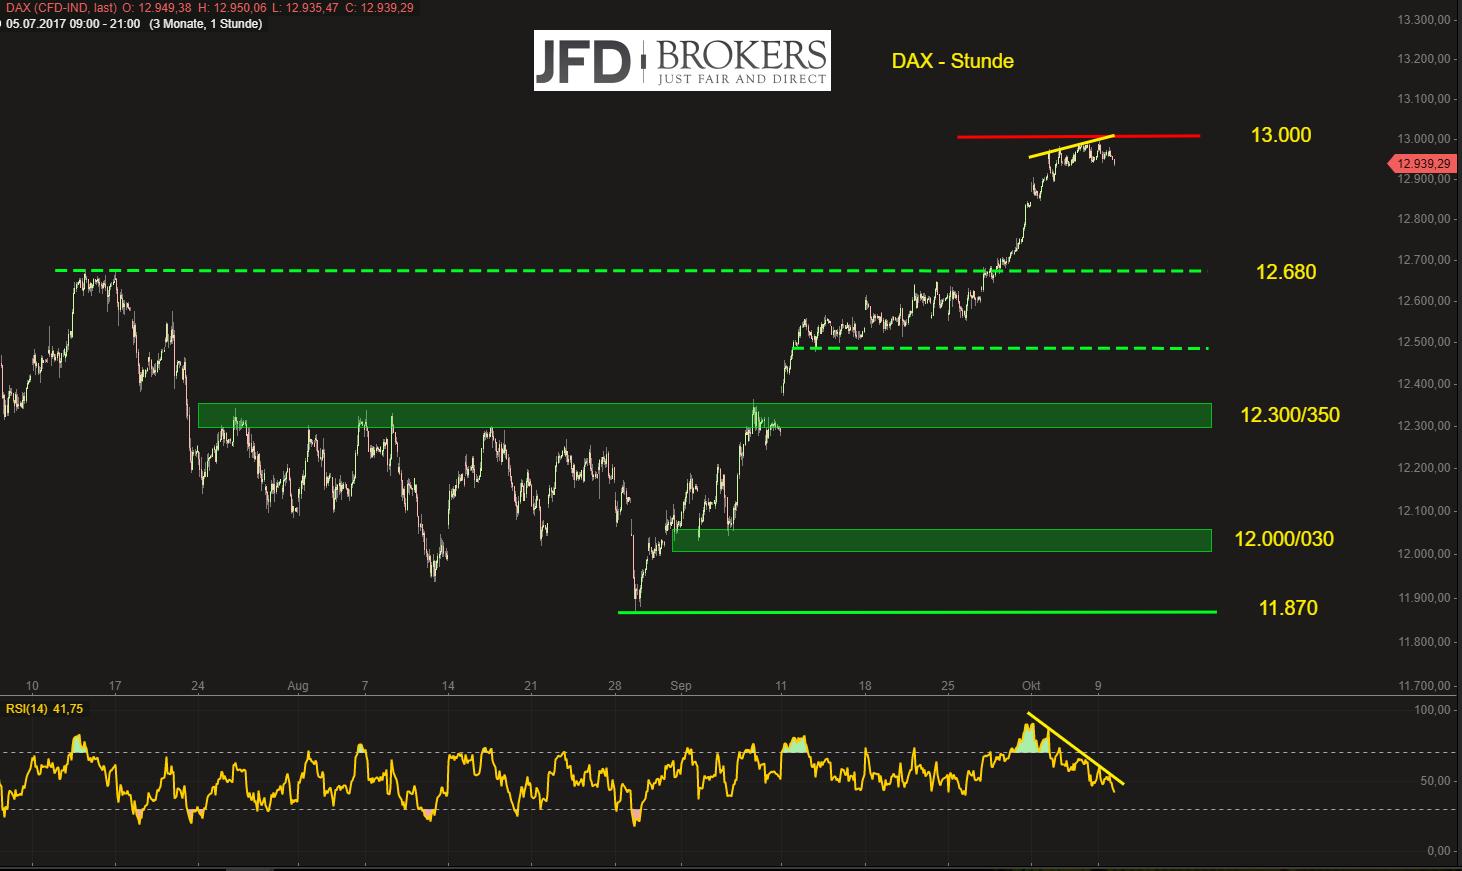 DAX-klappt-es-heute-mit-der-13-000-Kommentar-JFD-Brokers-GodmodeTrader.de-2